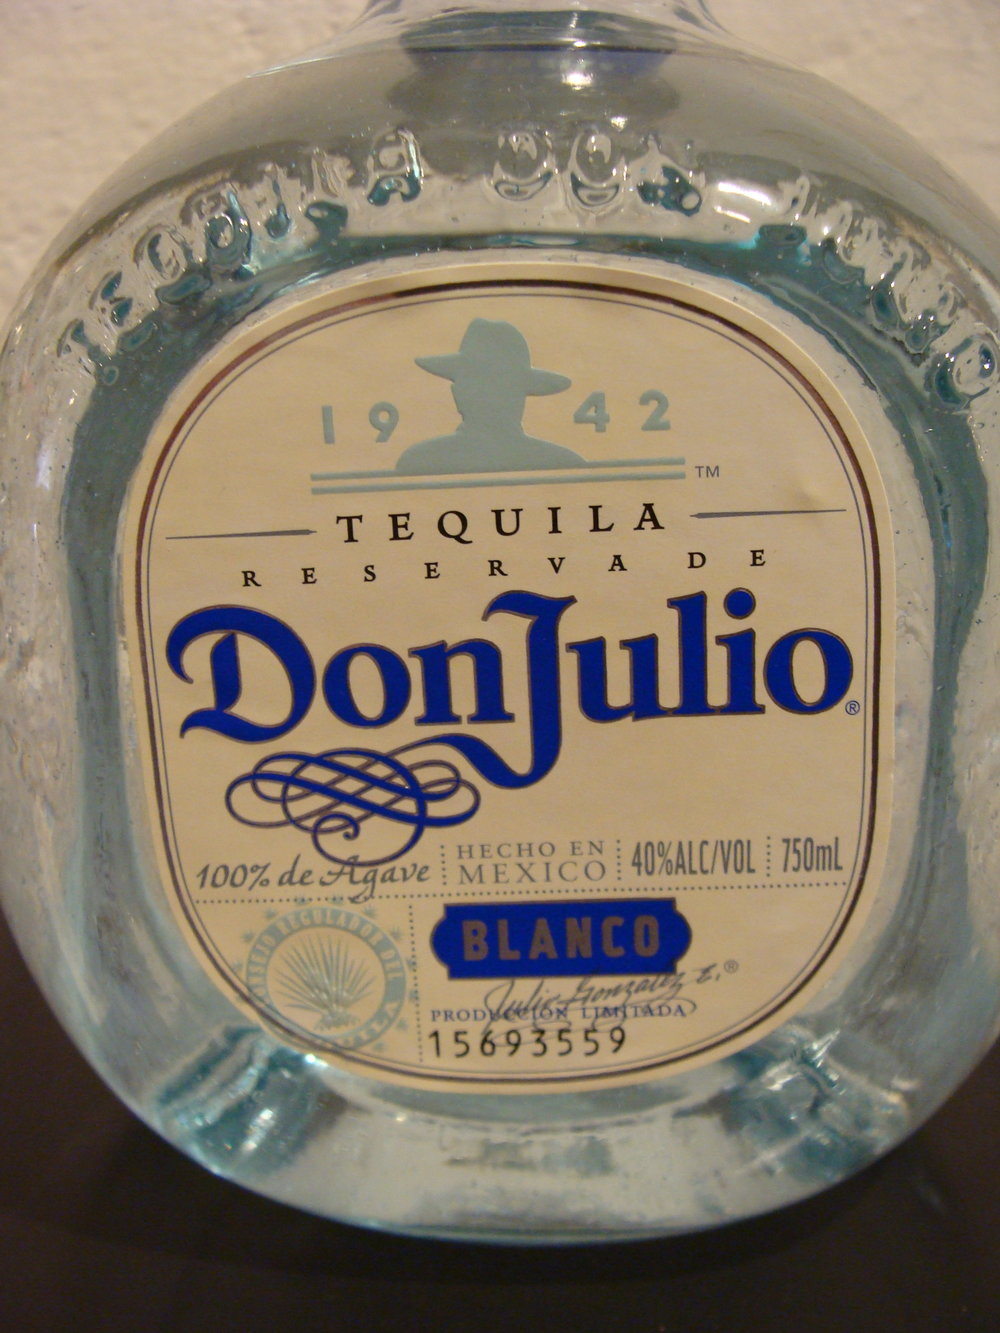 Don Julio Blanco Tequila Mayhew Wine Shop